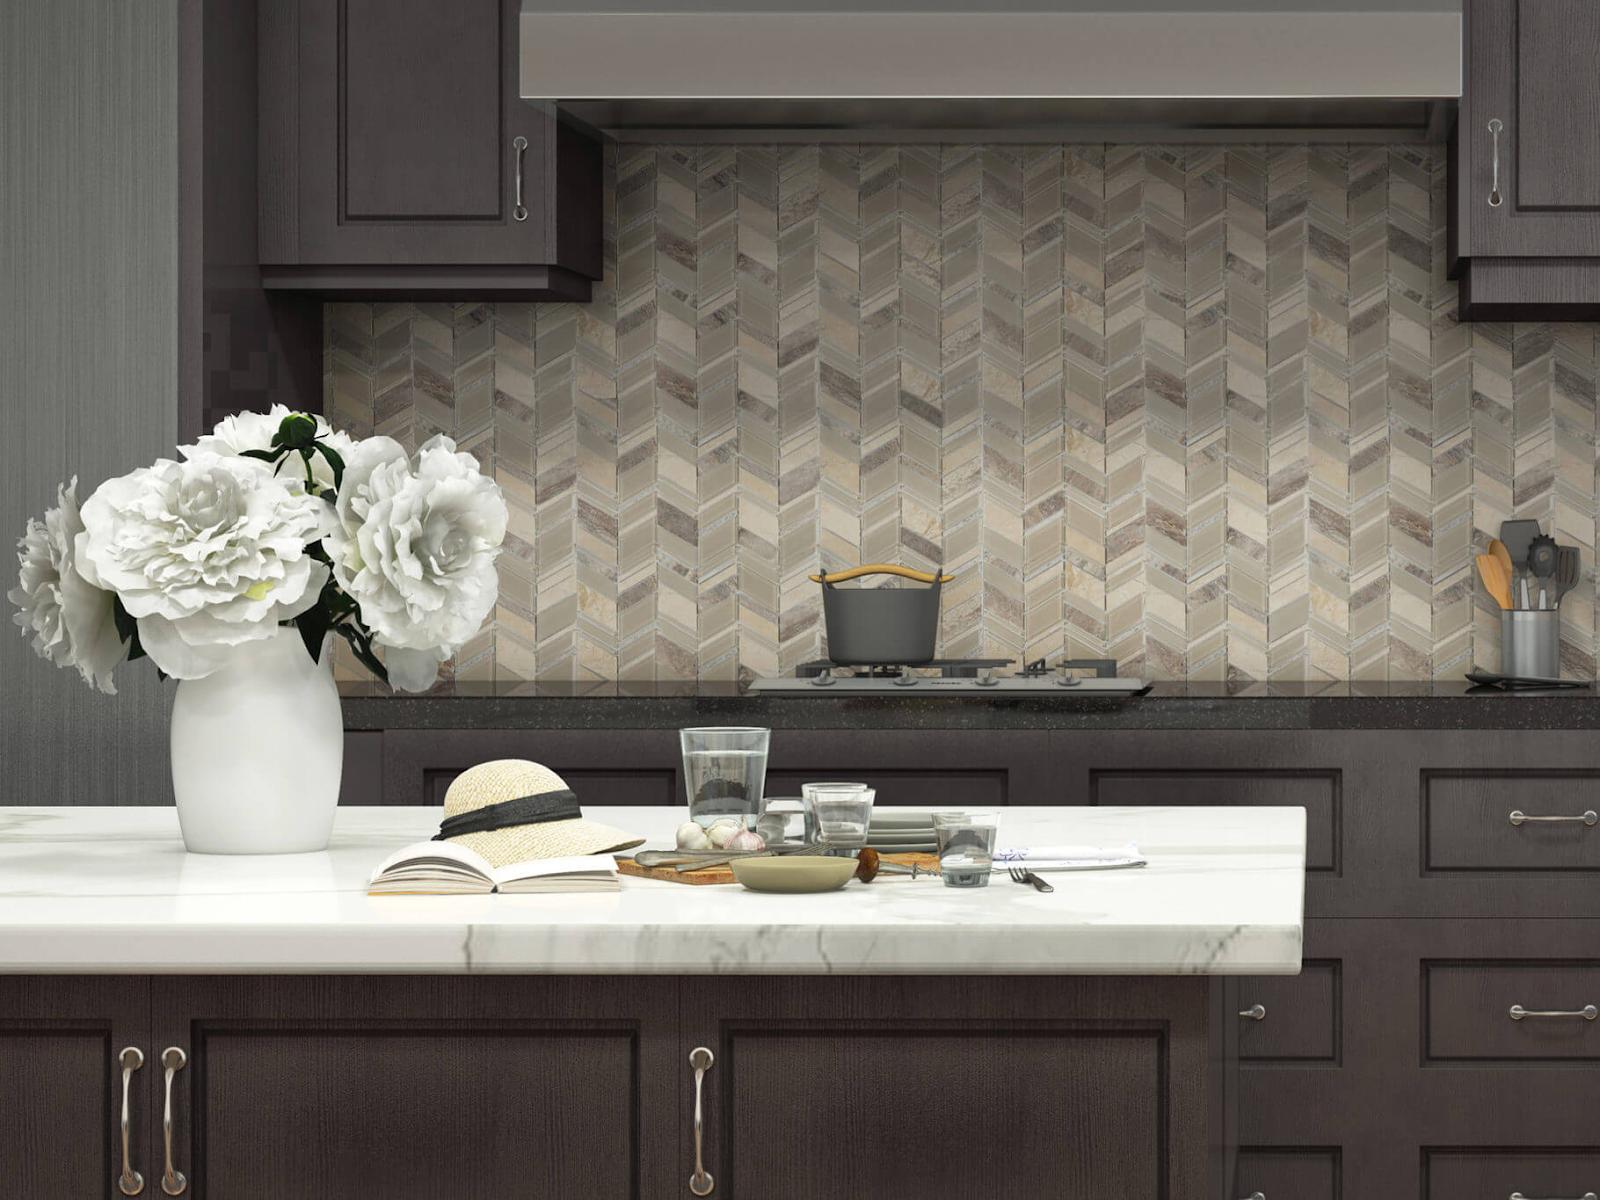 Chevron tile mosaic backsplash in light neutral tones